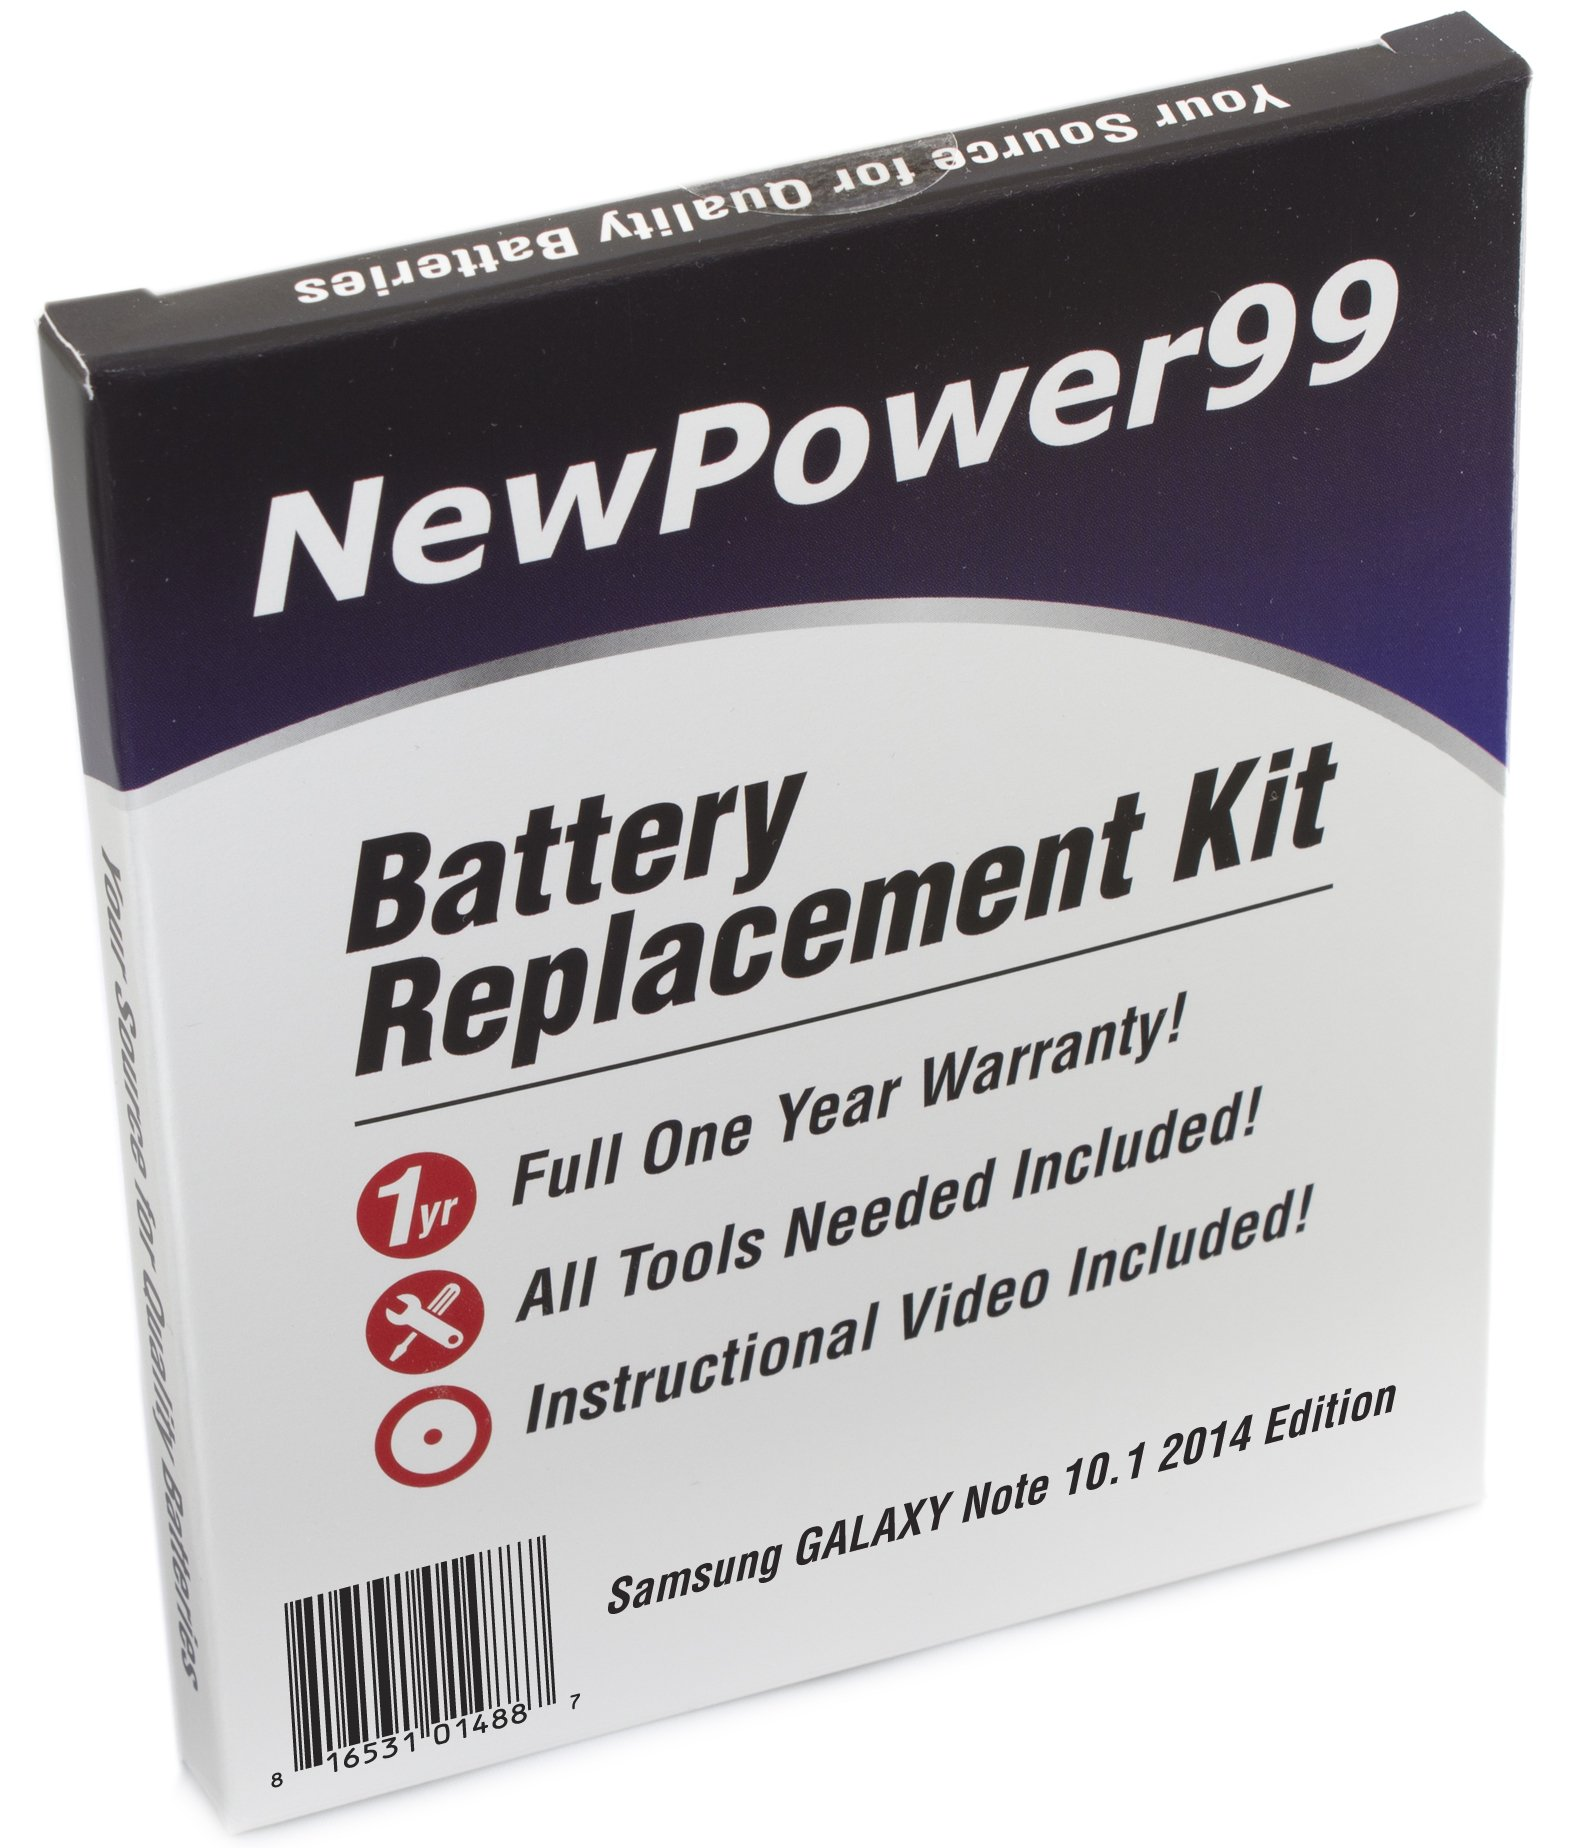 Bateria Tablet para Note 10.1 2014 Edition Tablets